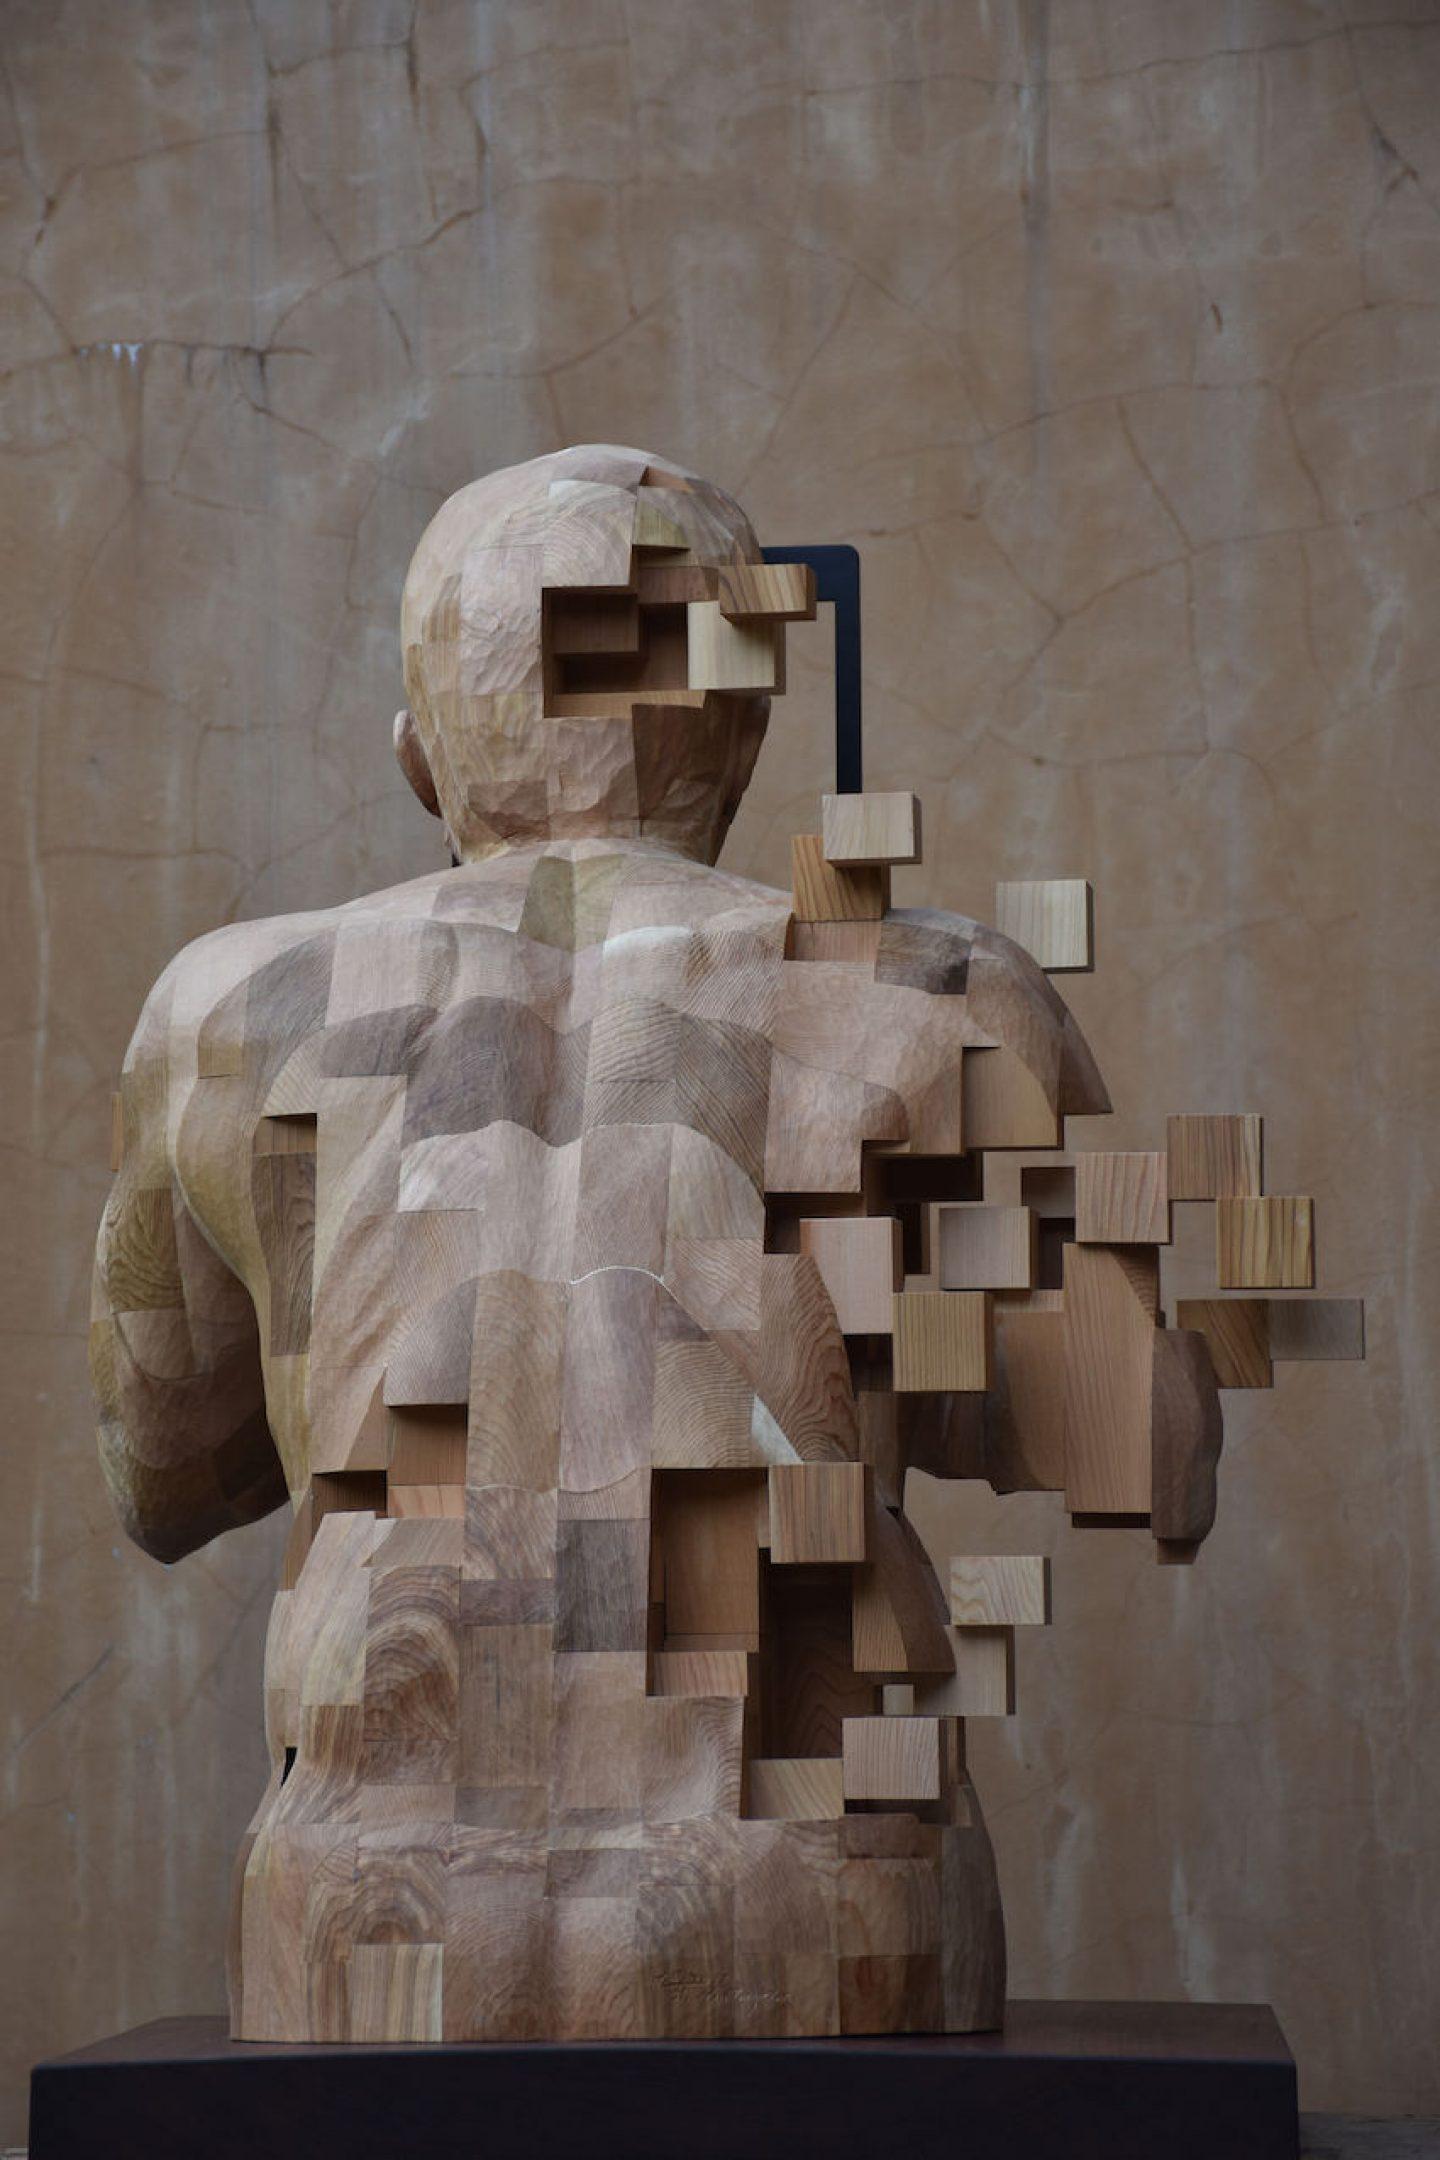 Pixelations By Hsu Tung Han_12